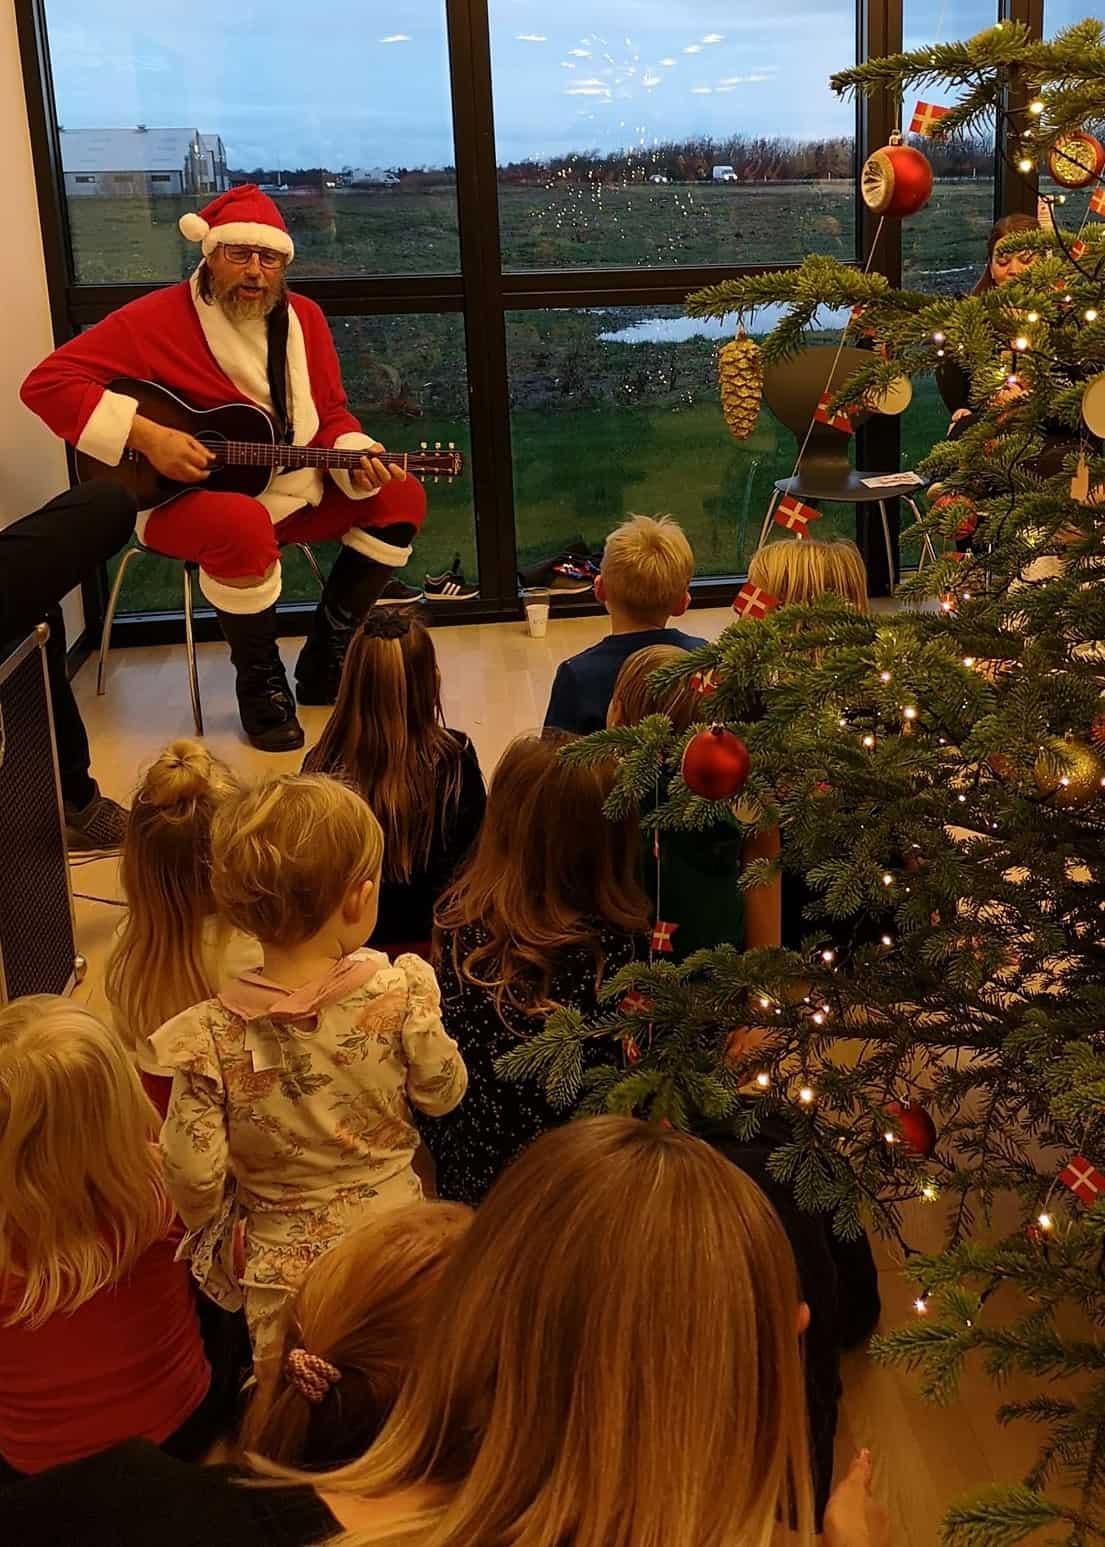 Vellykket Juletræs fest.